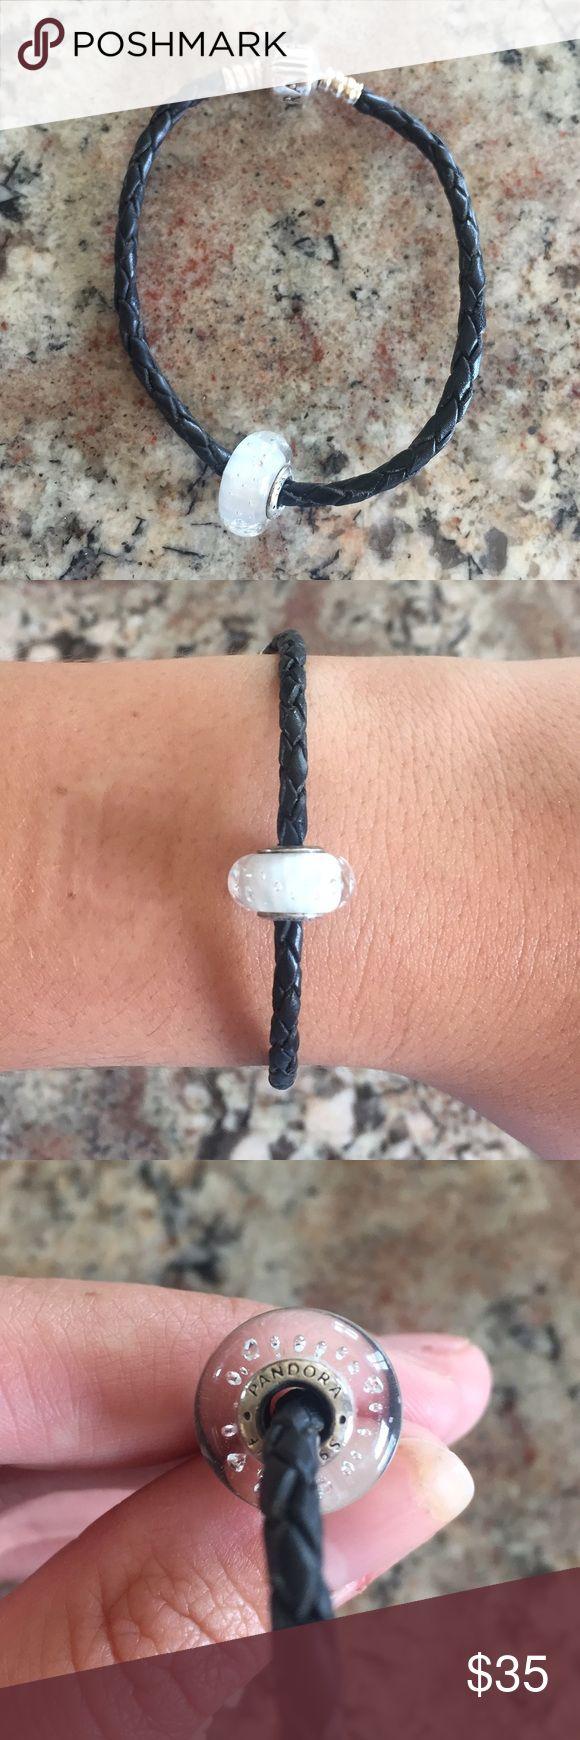 Pandora Bracelet Gently used black leather rope Pandora bracelet WITH beautiful glass bead. Originally an $80 value!! Feel free to make an offer. Pandora Jewelry Bracelets